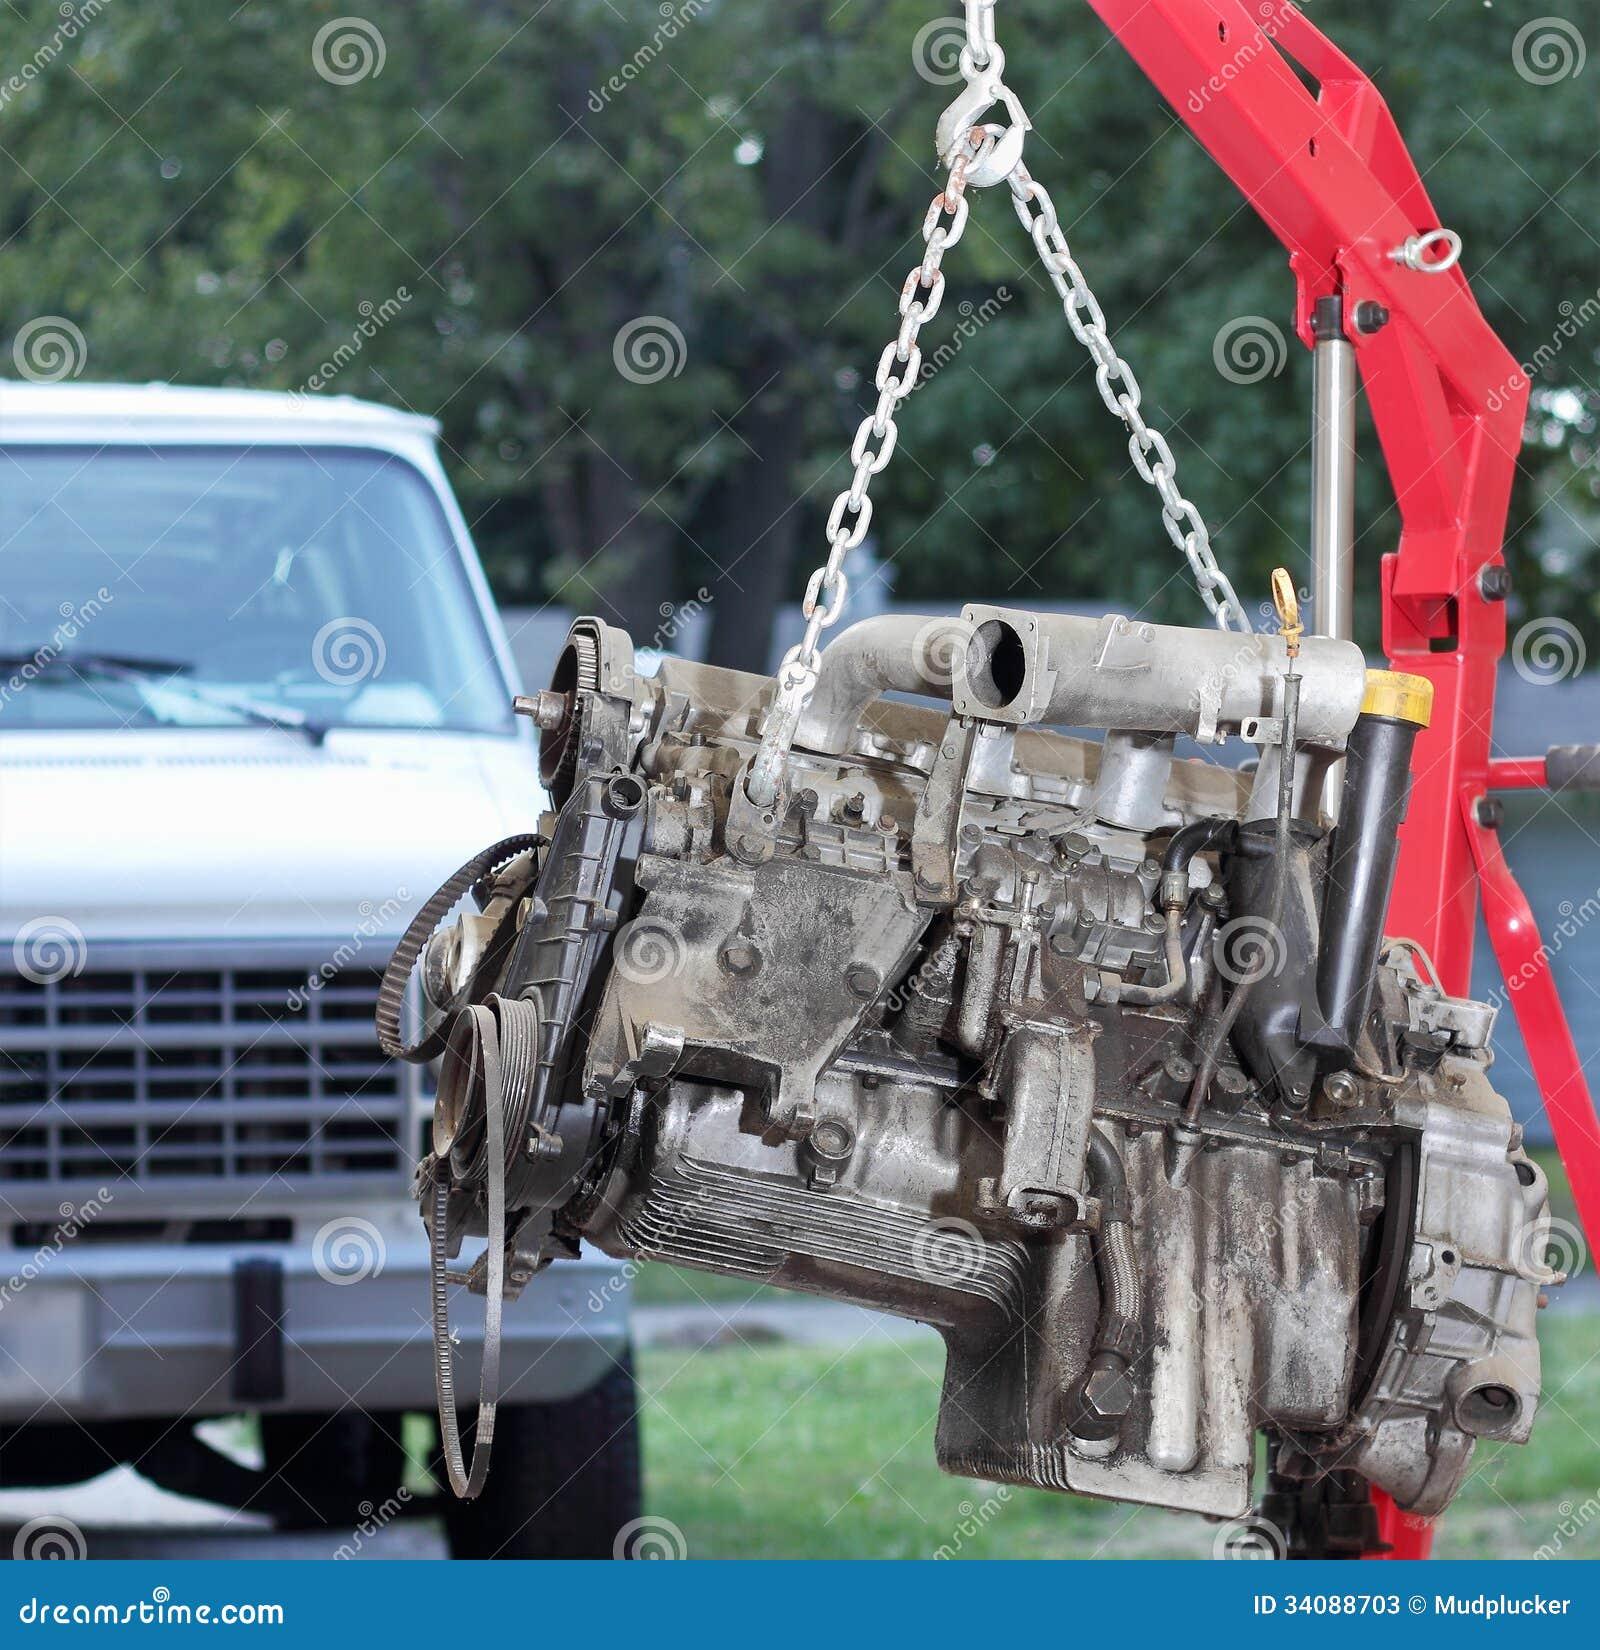 Backyard Home Mechanic Stock Photos